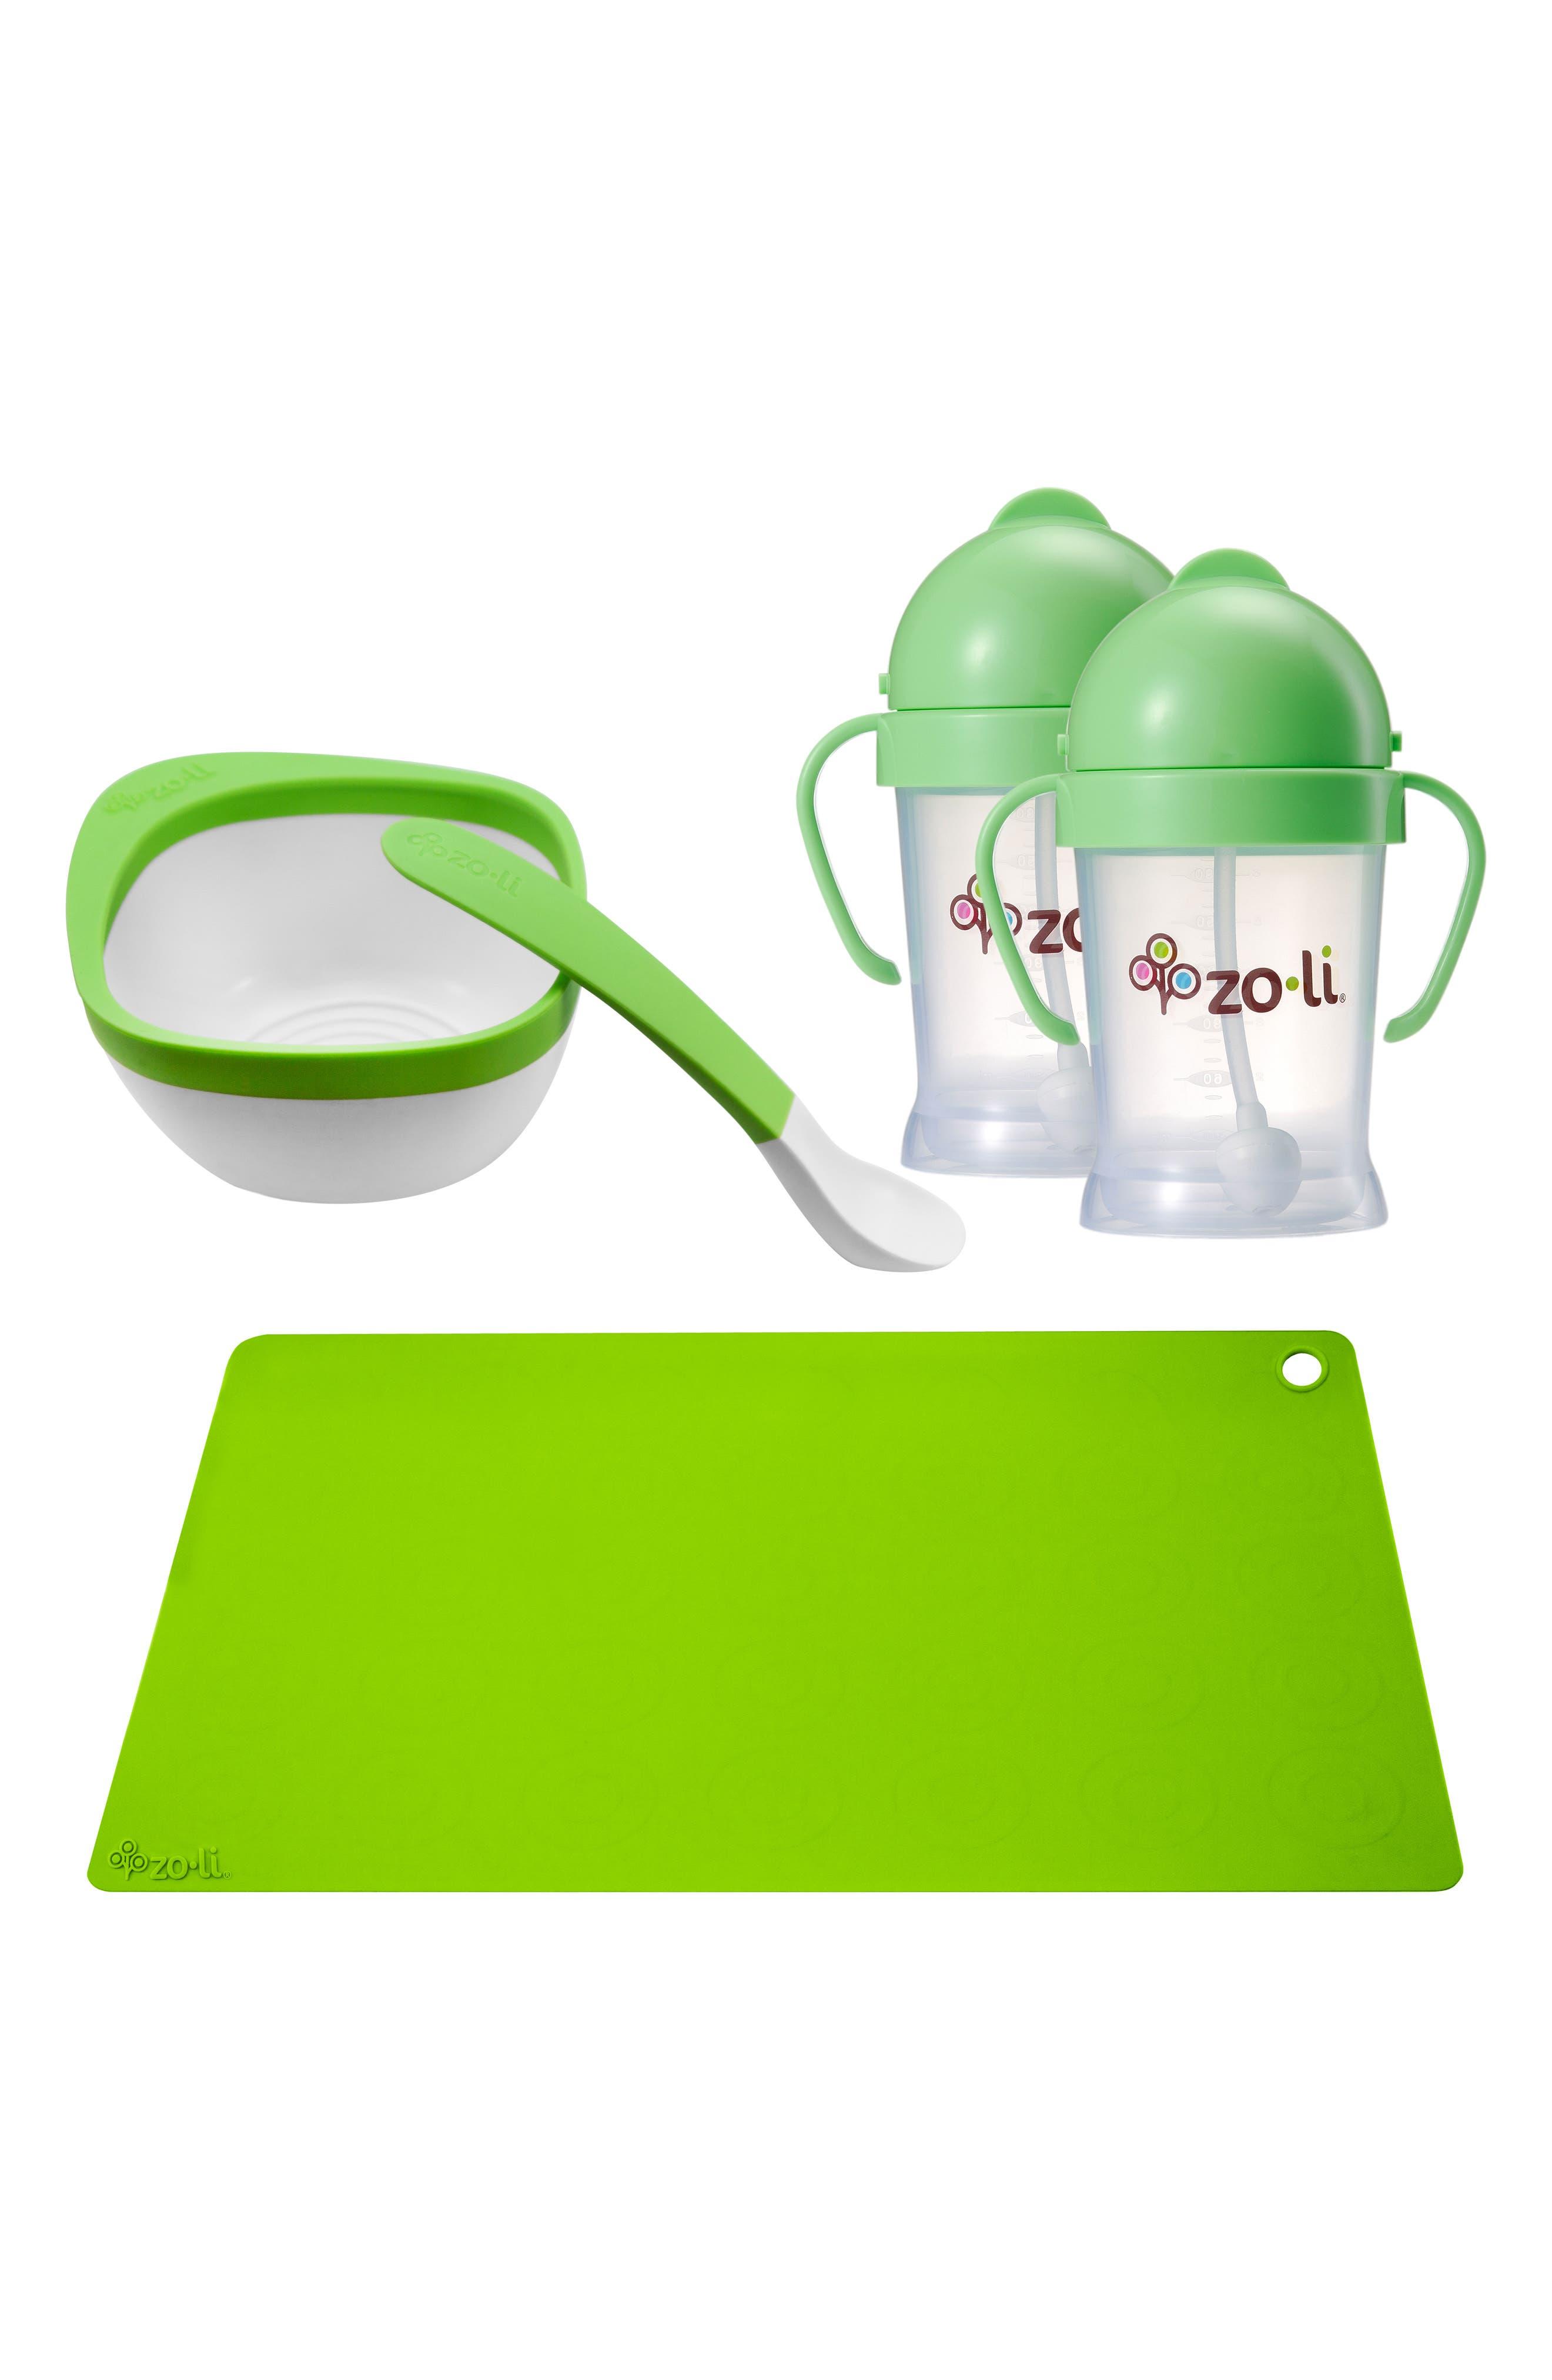 Toddler Mealtime 5-Piece Set,                             Main thumbnail 1, color,                             Green